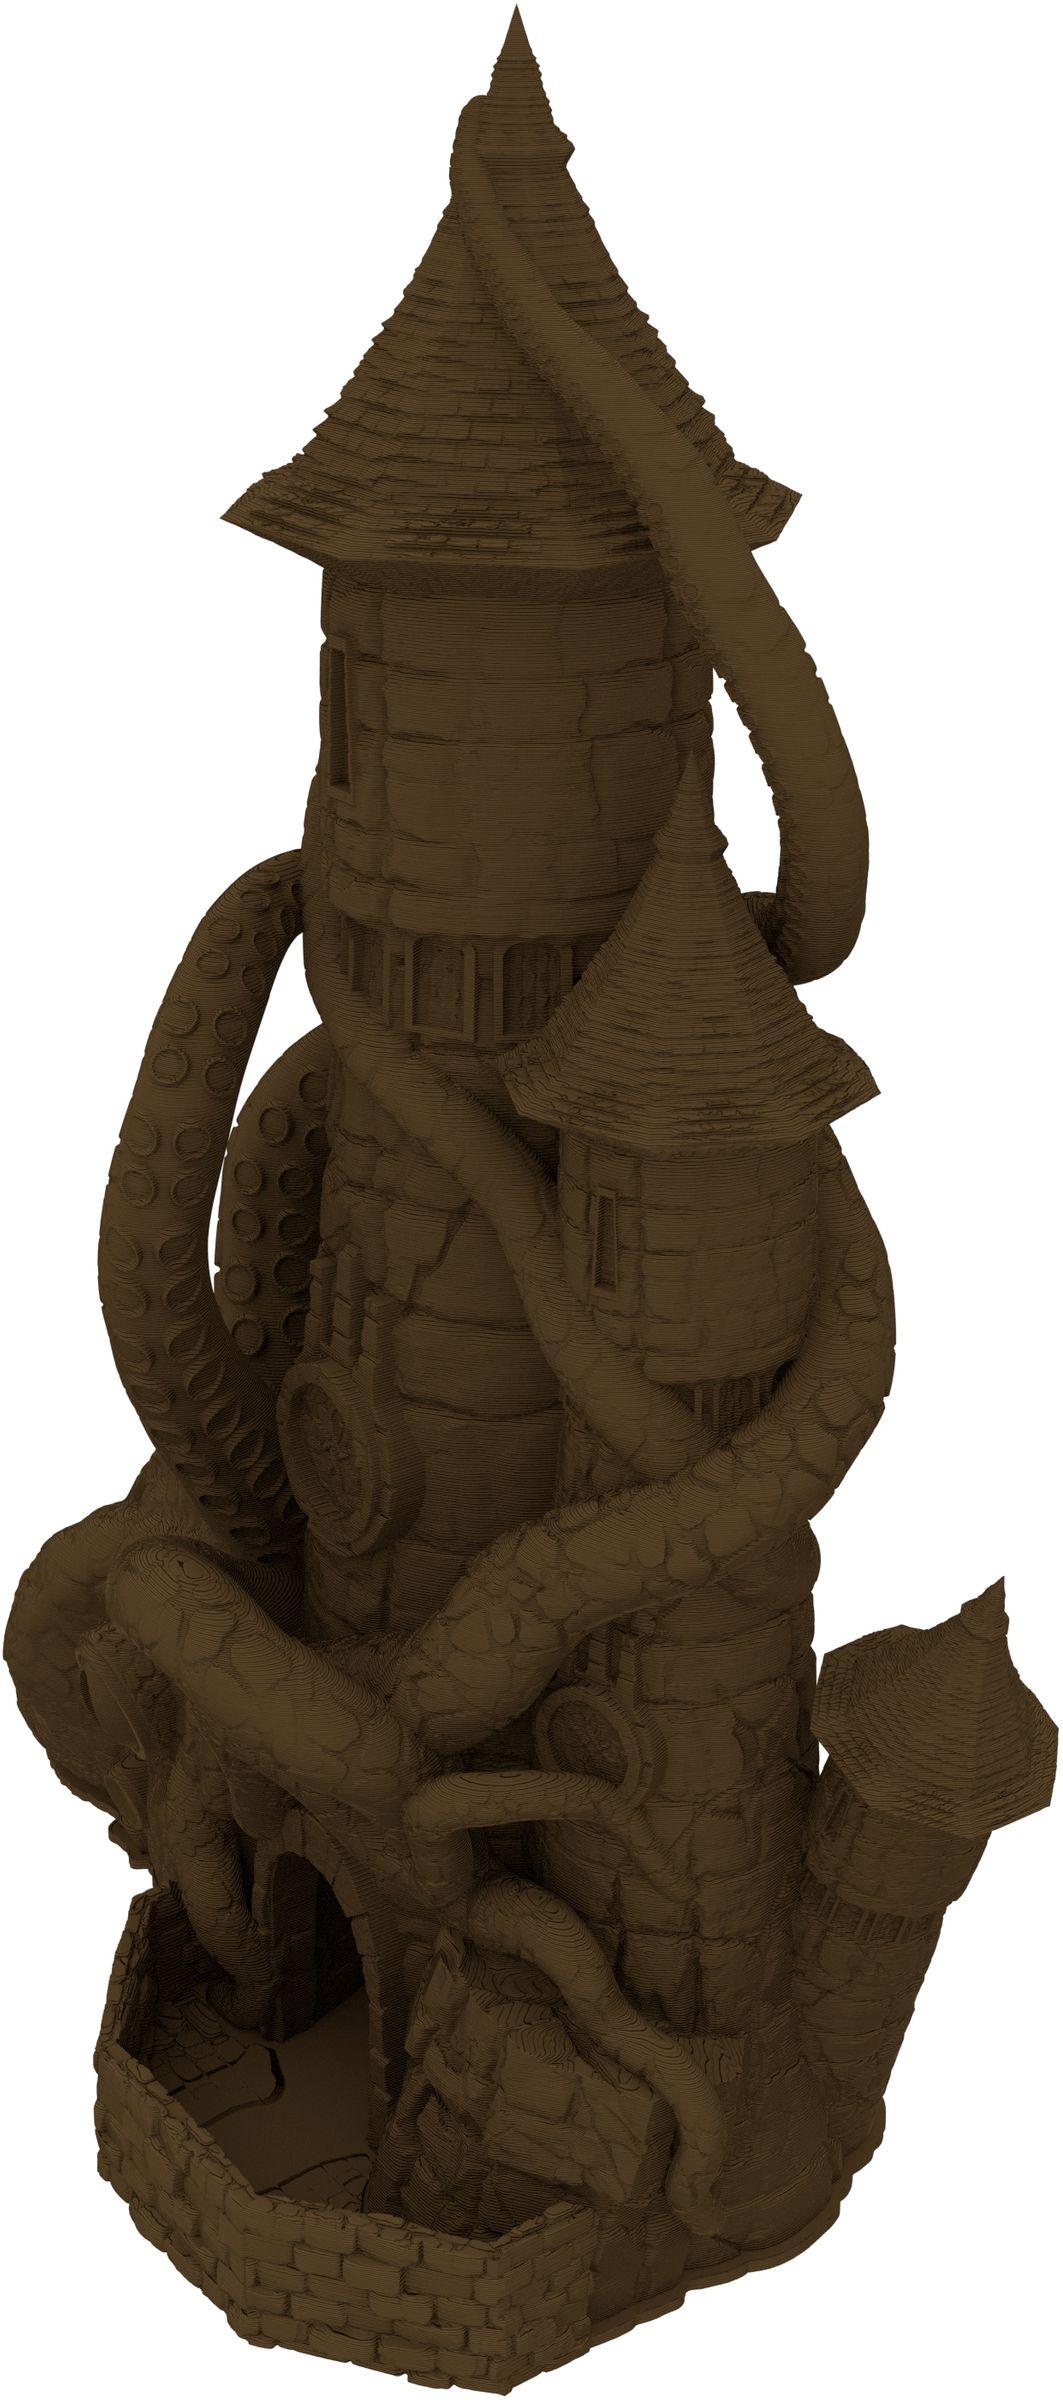 Fates End Dice Tower: Kraken